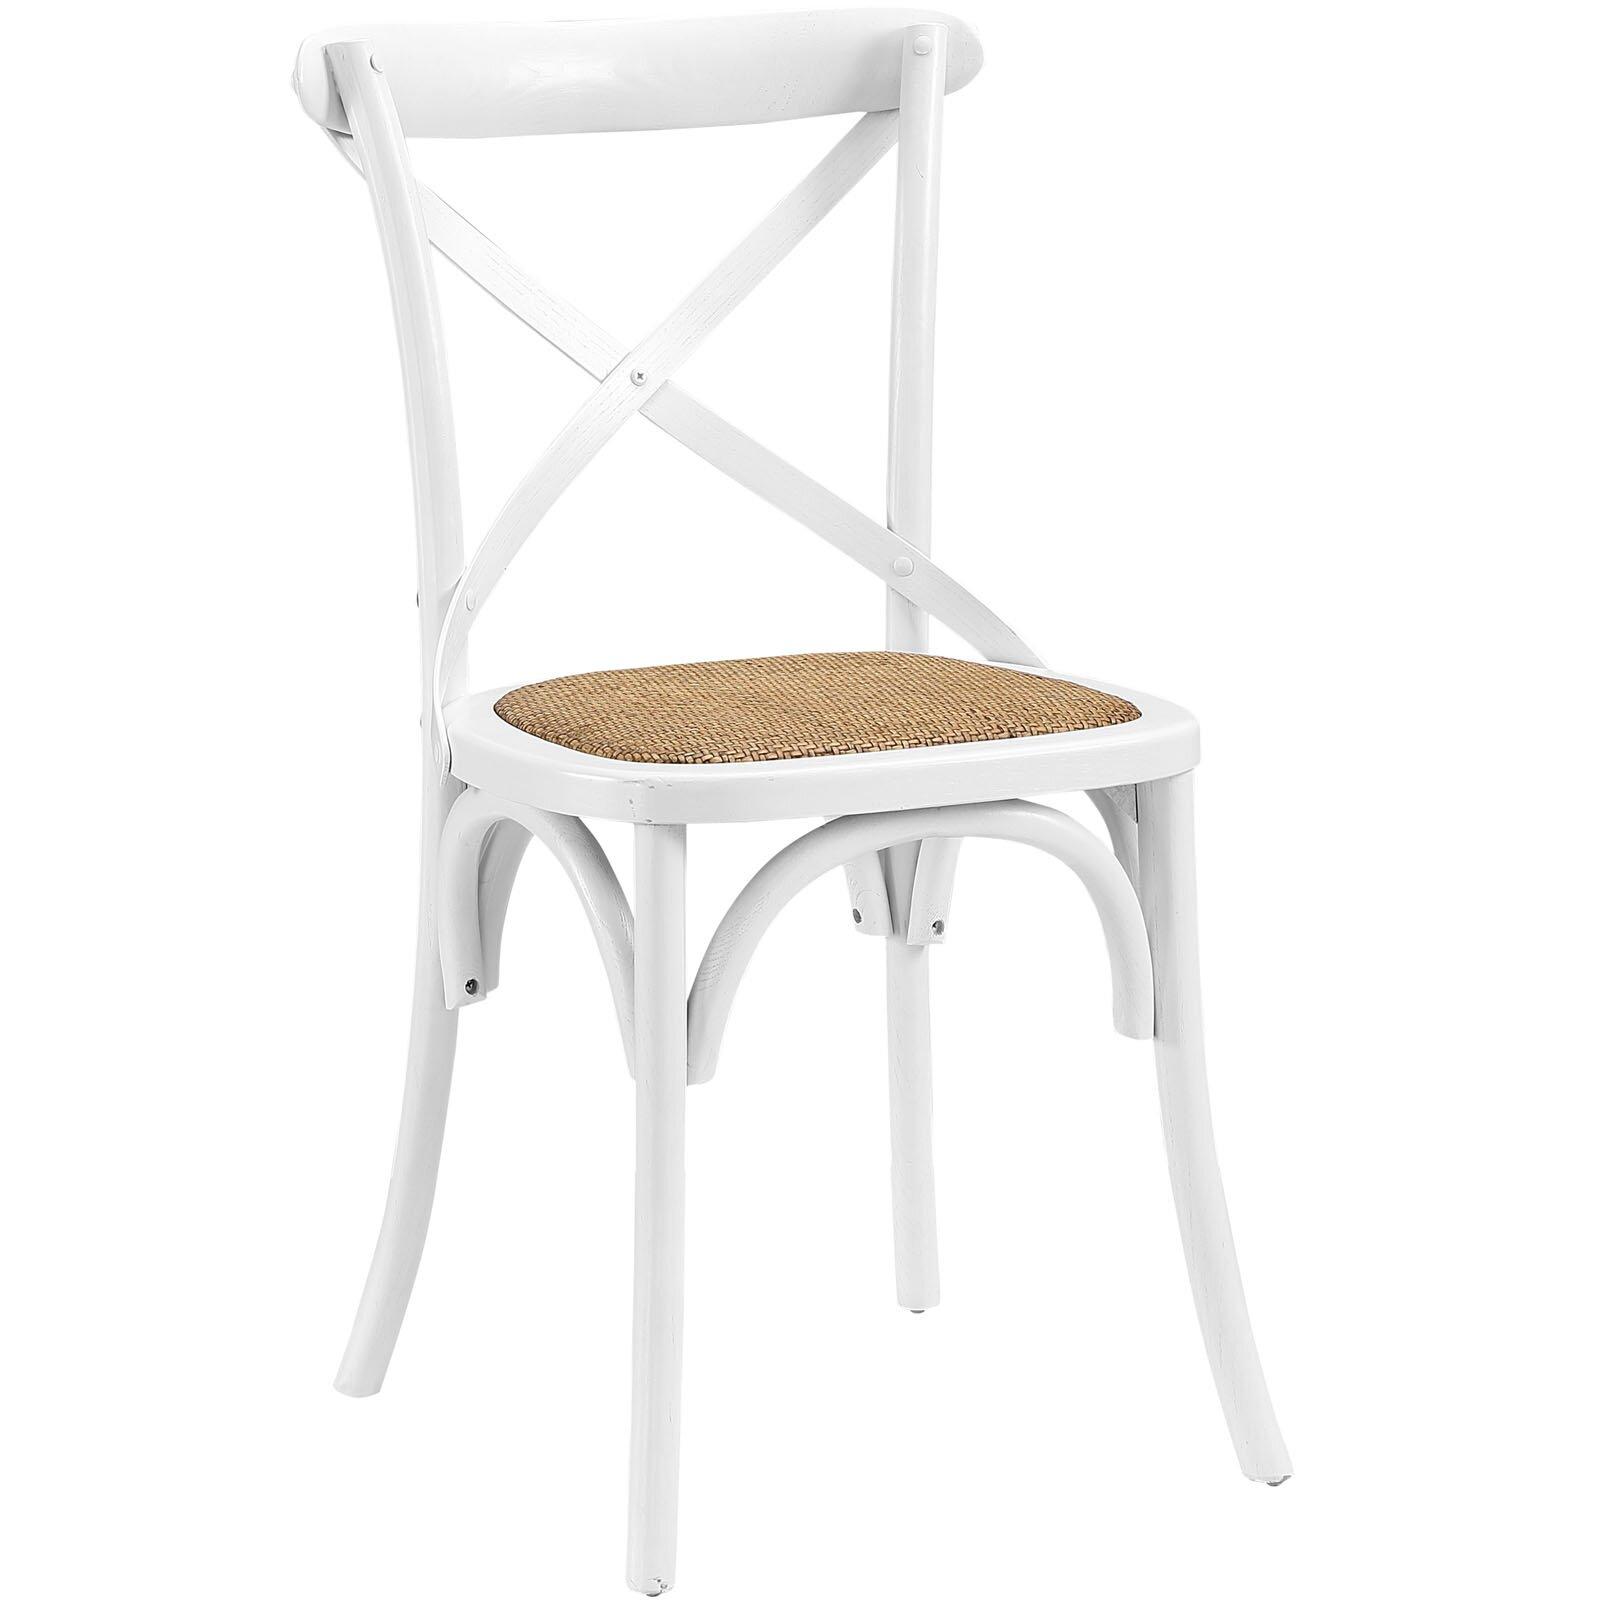 Wayfair - 11 Reviews - Furniture Stores - 5101 Renegade ...